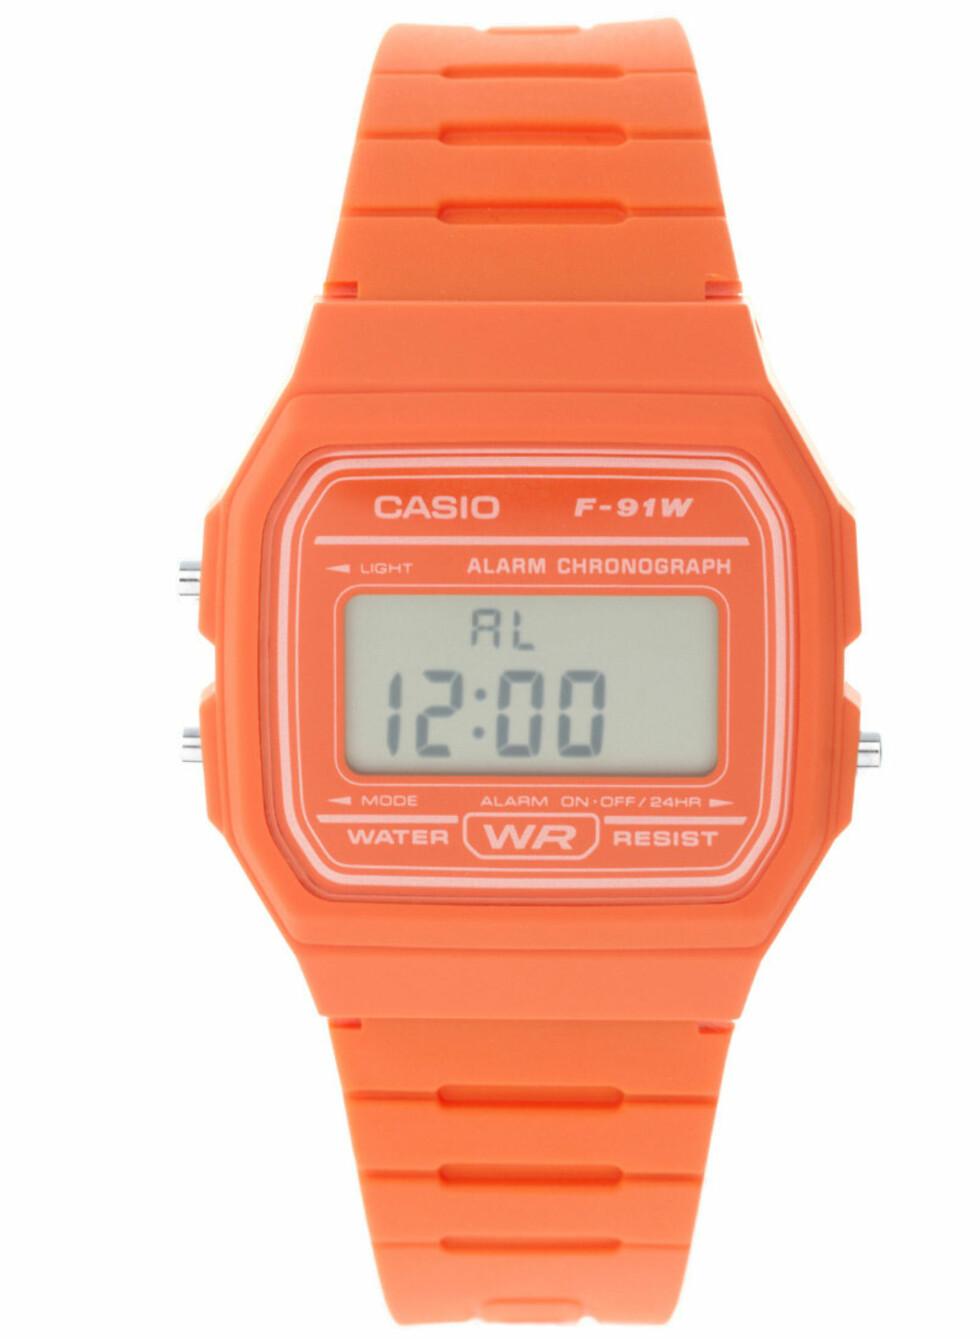 Cirka kr 200, Casio/Asos.com.